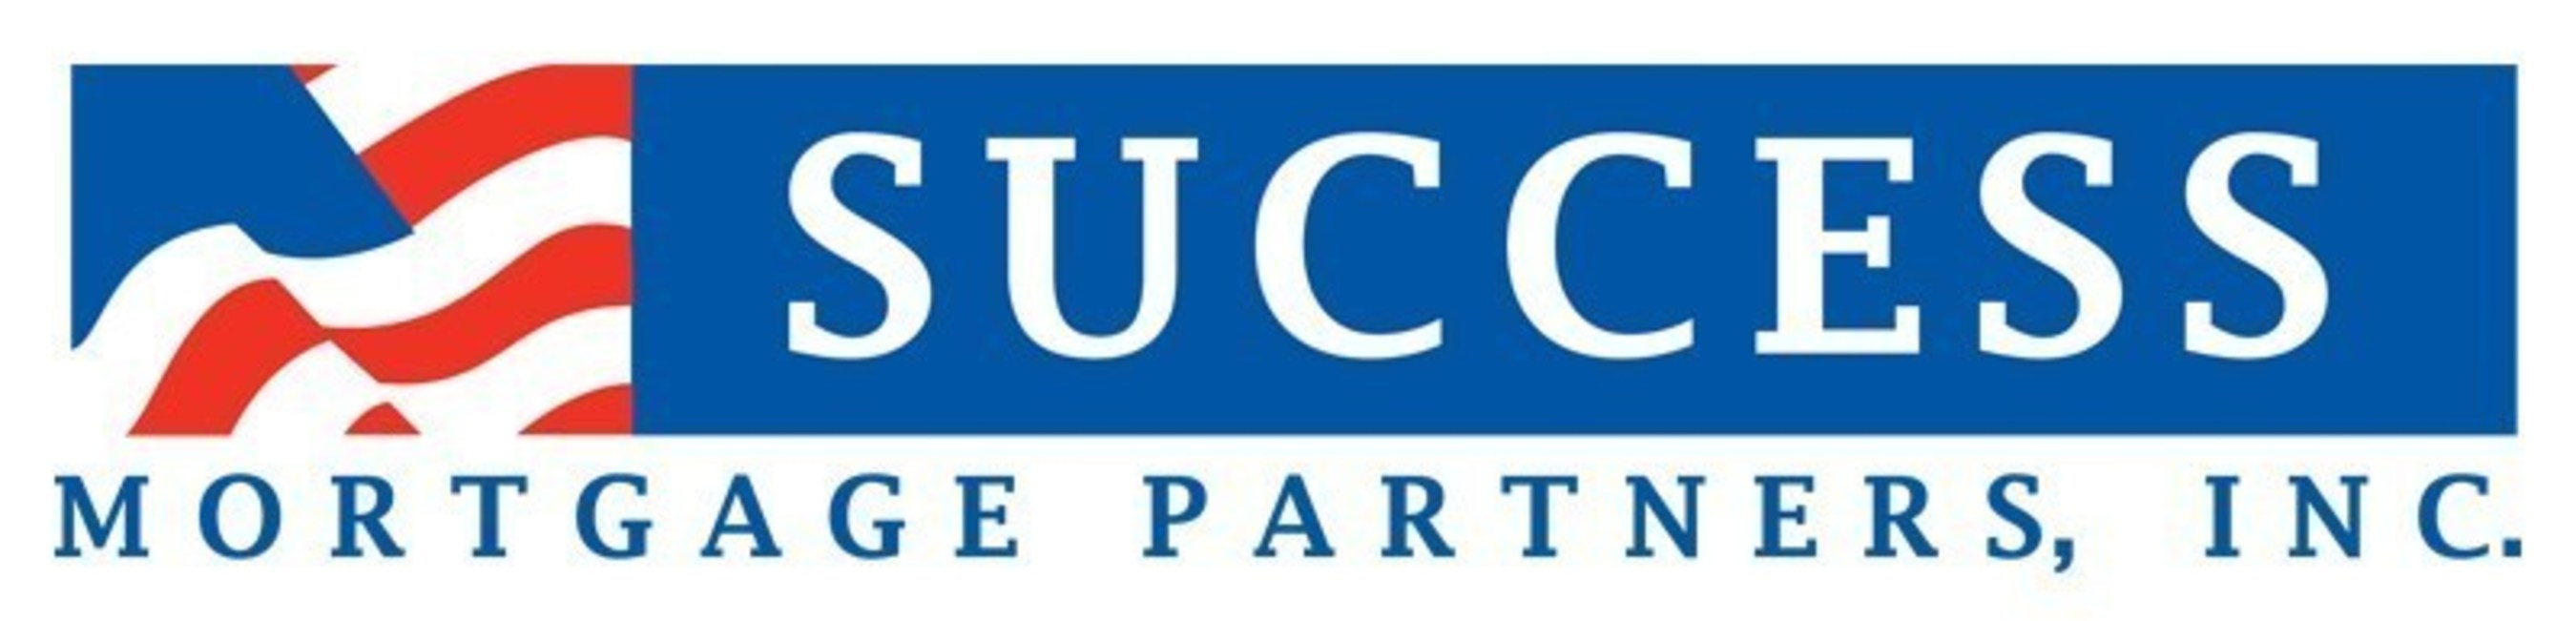 Success Mortgage Partners, Inc.